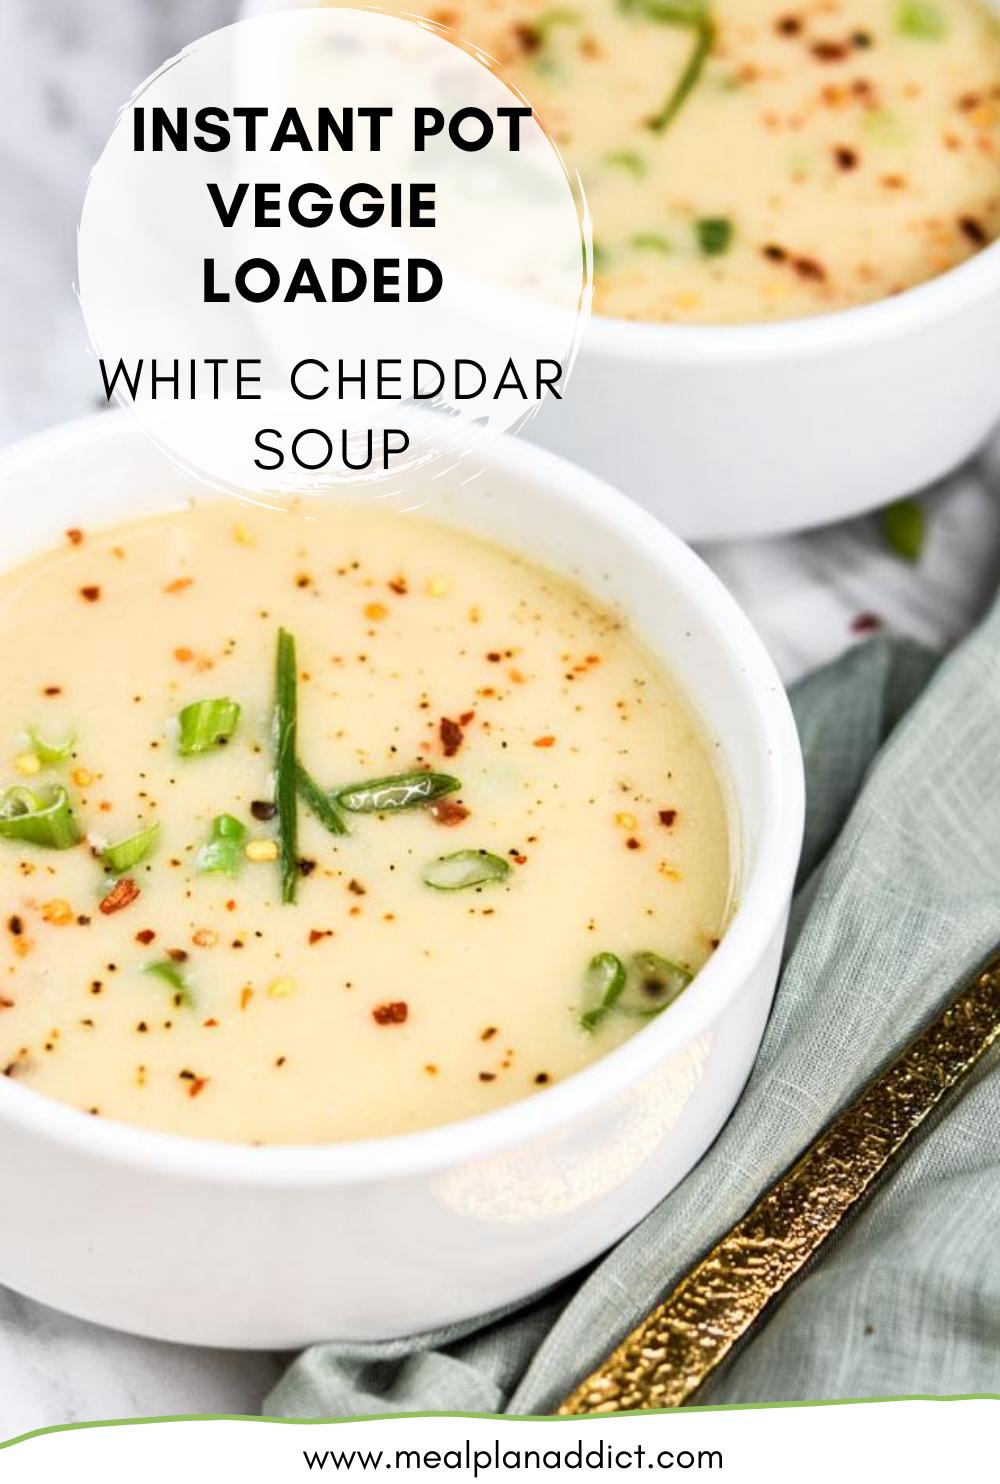 Instant Pot Veggie Loaded White Cheddar Soup